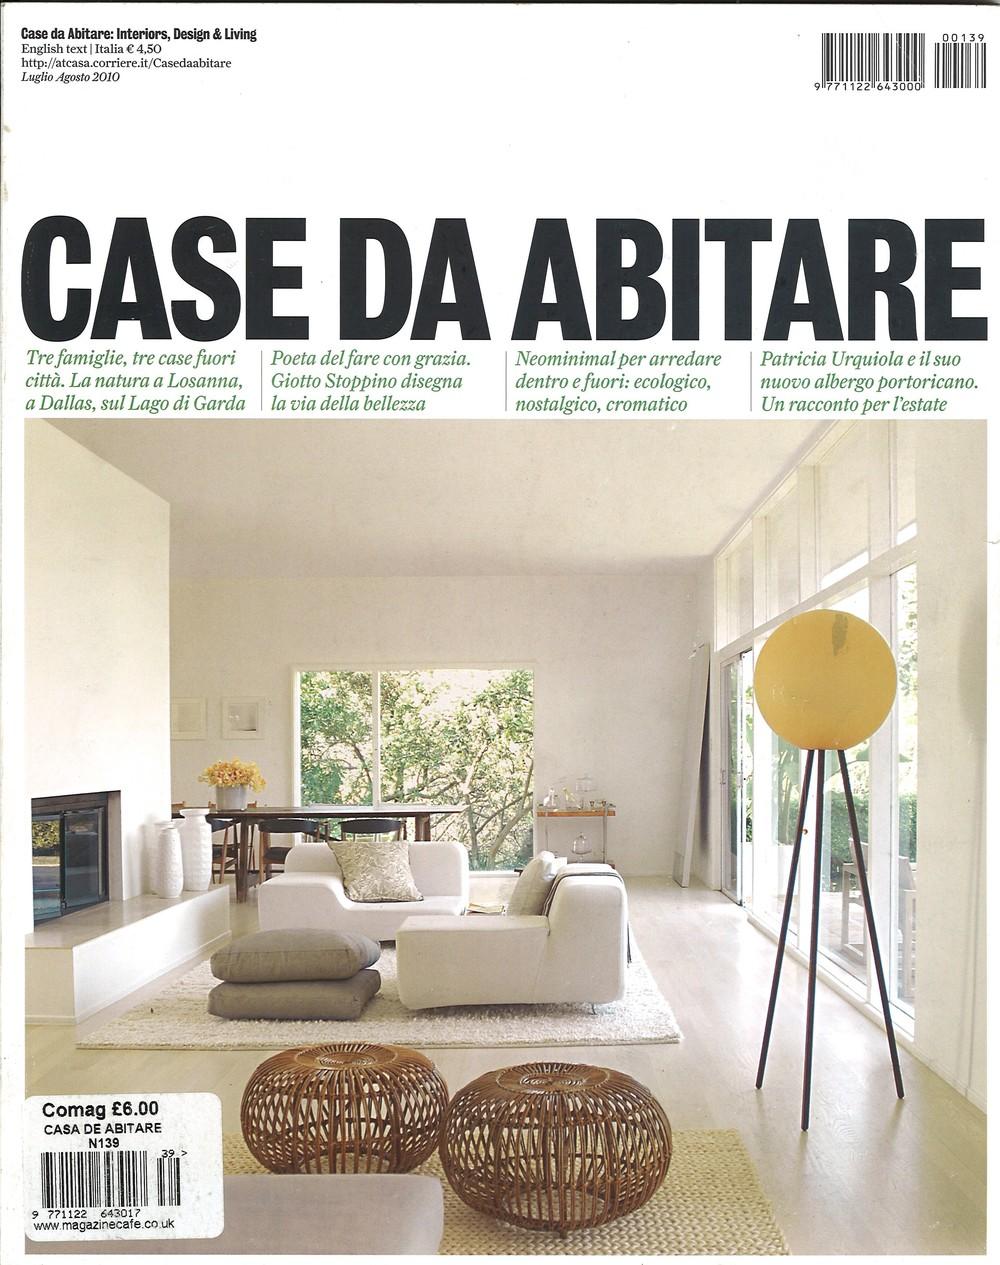 Publication: Casa Da Abitare, July/ August 2010